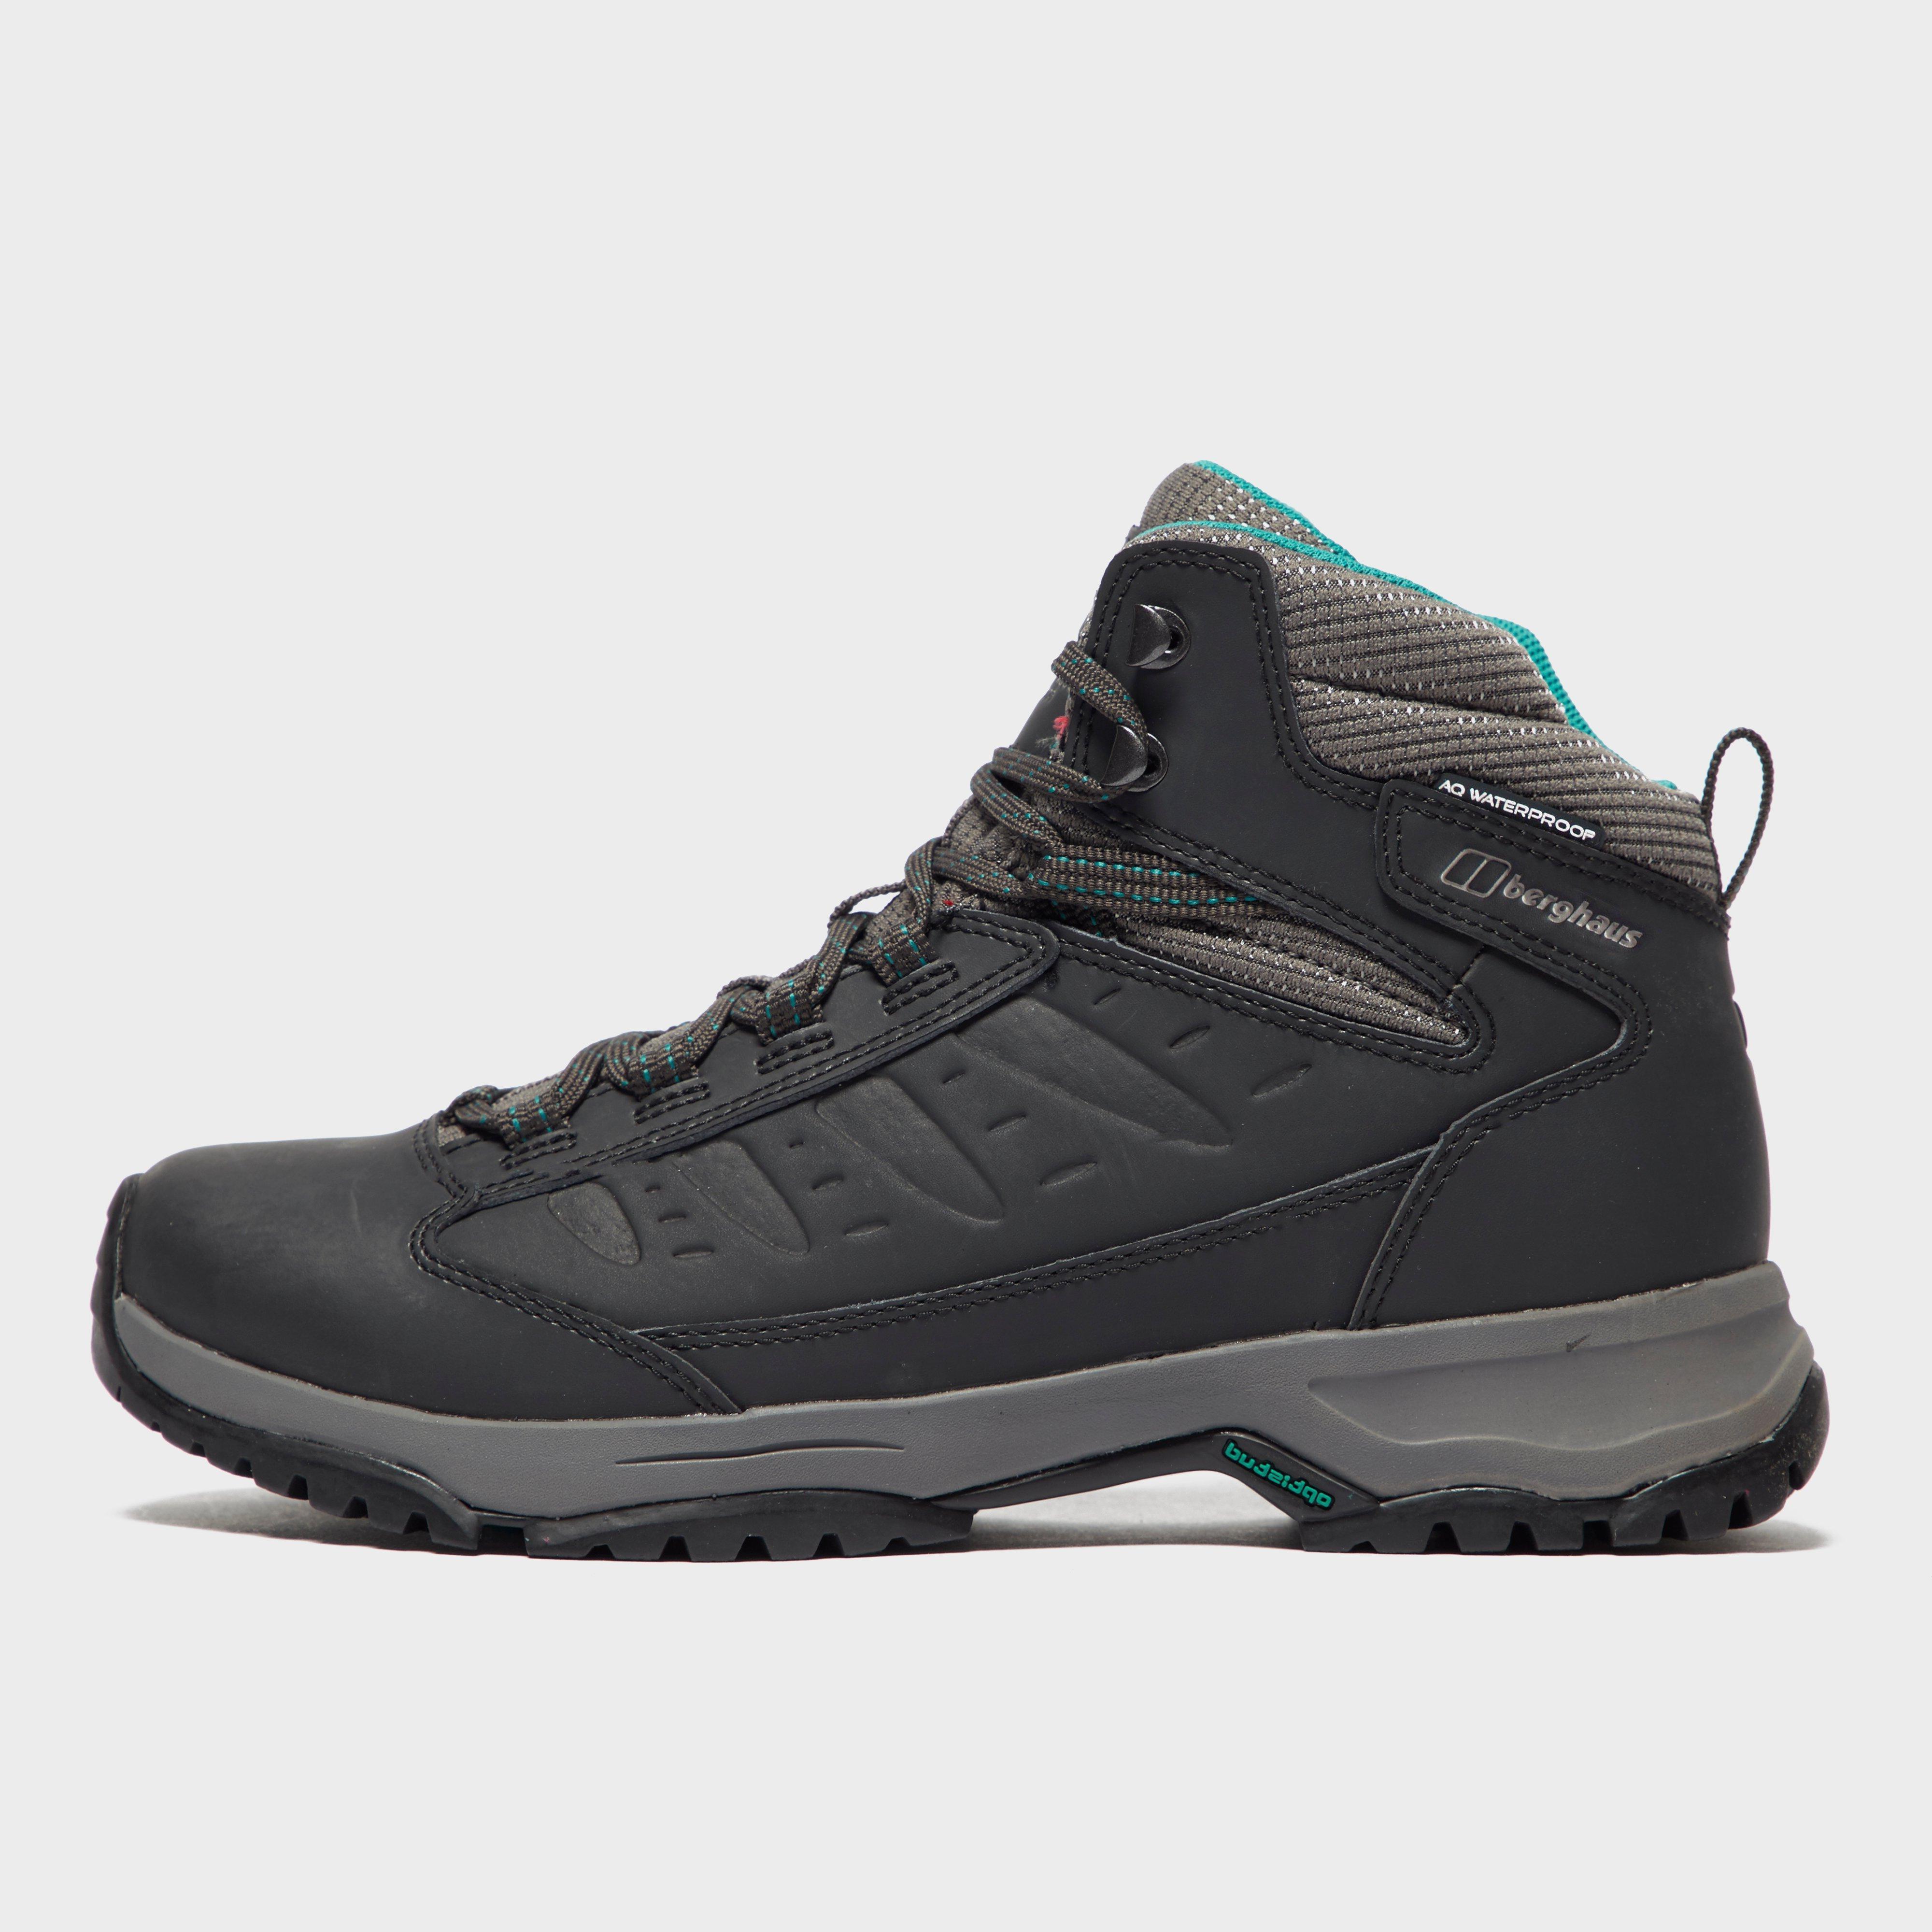 Berghaus Womens Expeditor Ridge 2.0 Boots - Black/grey  Black/grey